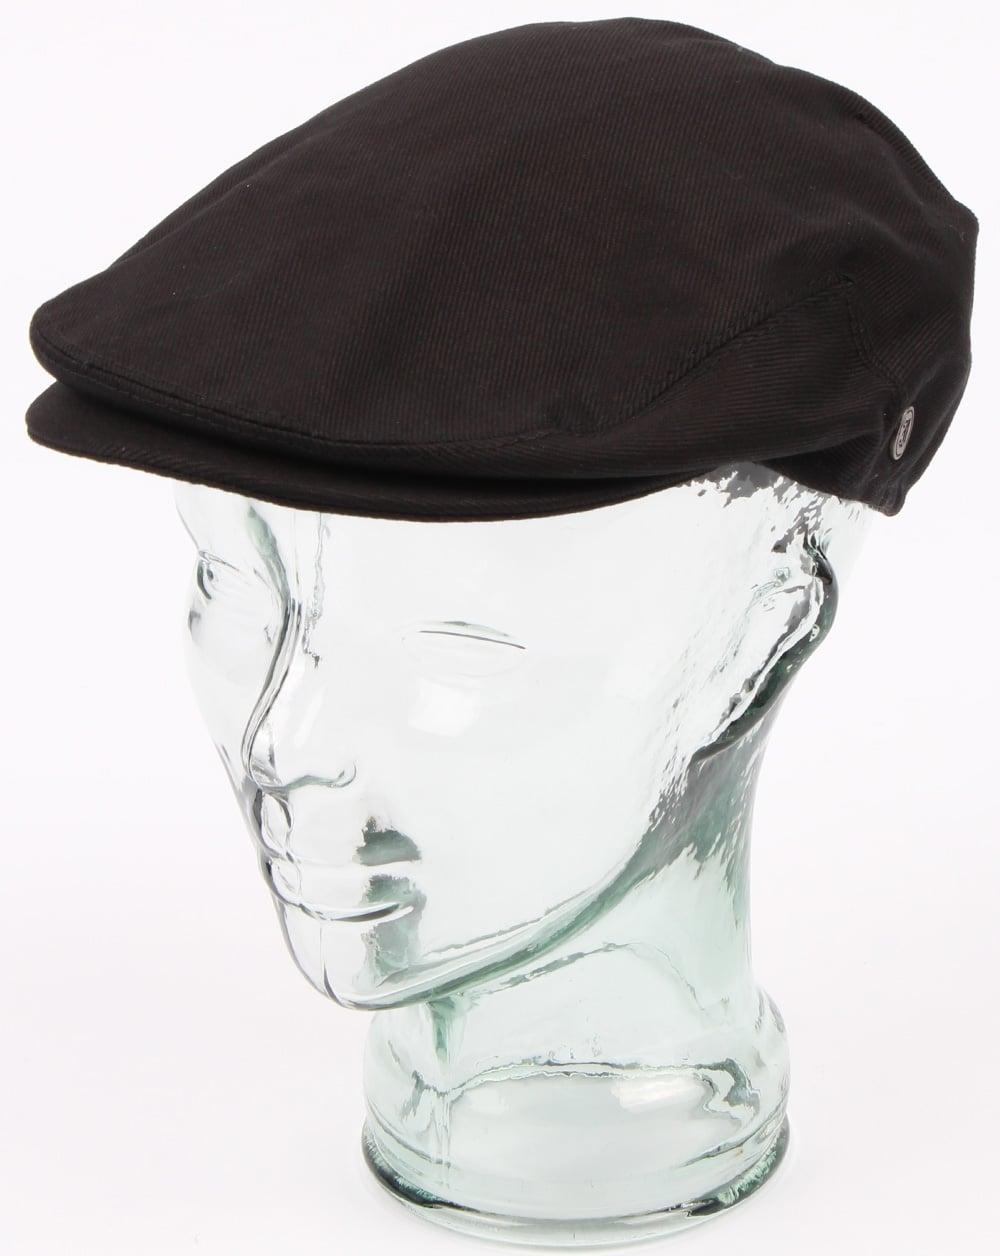 f9a73daa Cotton Flat Cap Black, Mens, Hat, Peaky Blinders | 80s casual classics